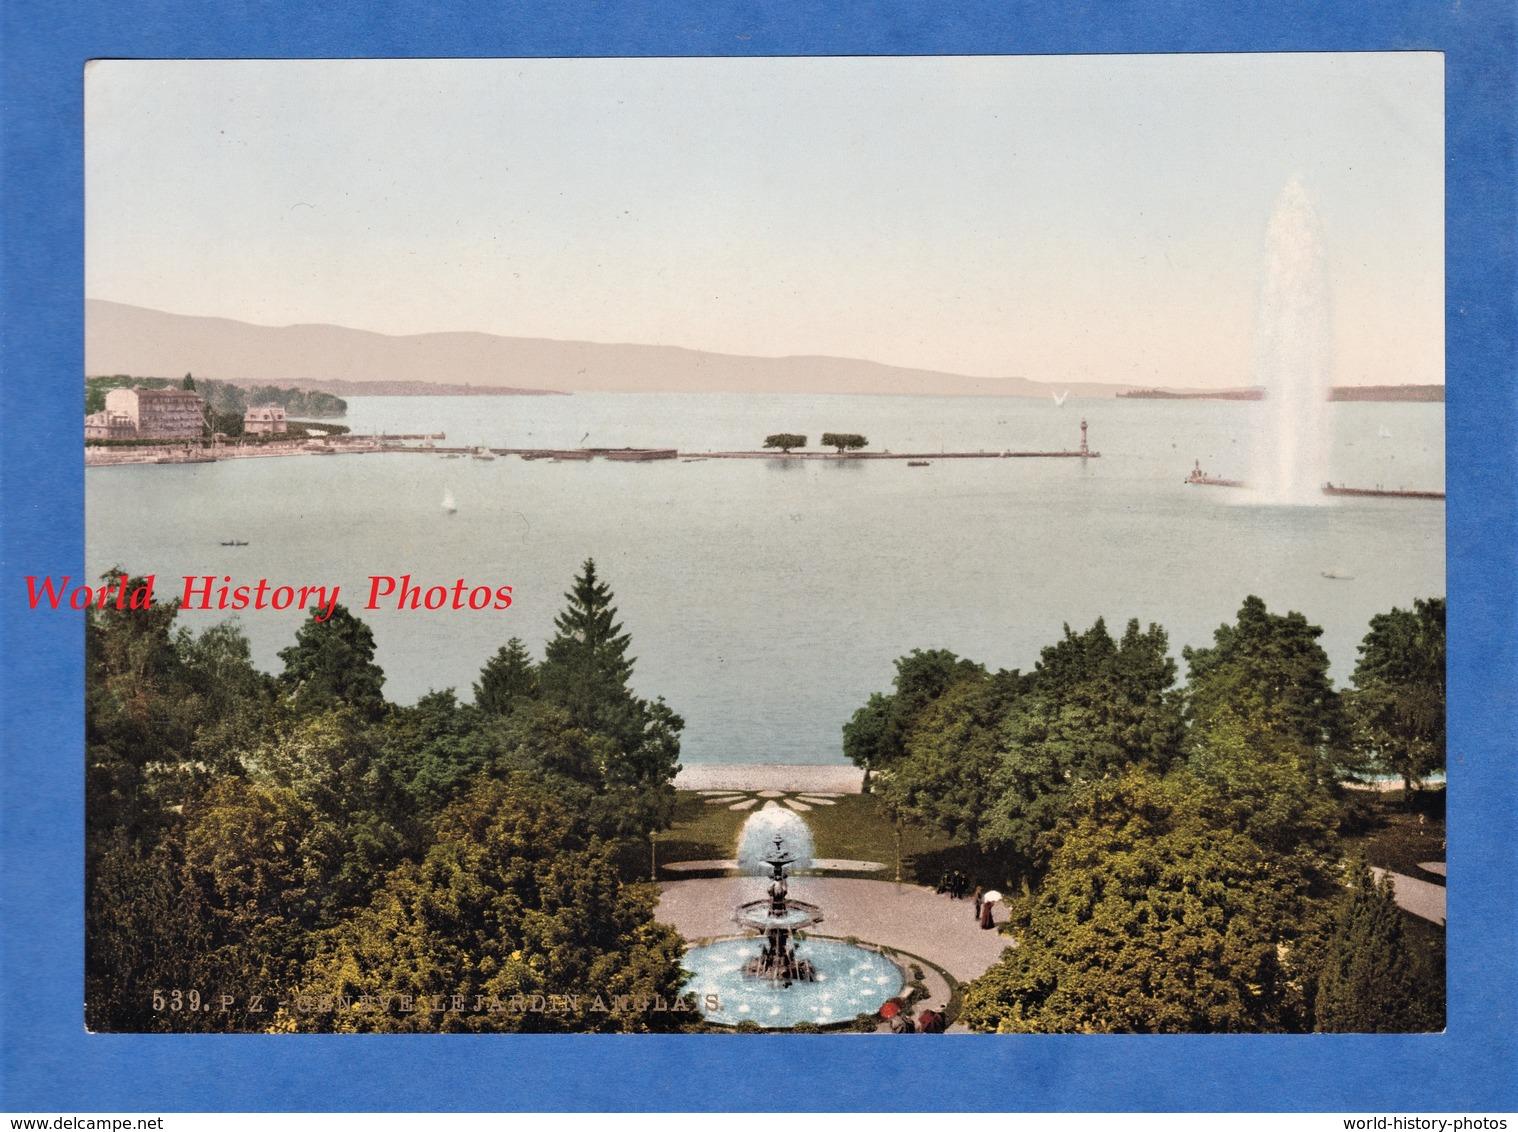 Photo Ancienne Photochrome - N° 539 P.Z. - GENEVE - Le Jardin Anglais- RARE - Lac Léman - Photochrom Zurich Suisse - Anciennes (Av. 1900)